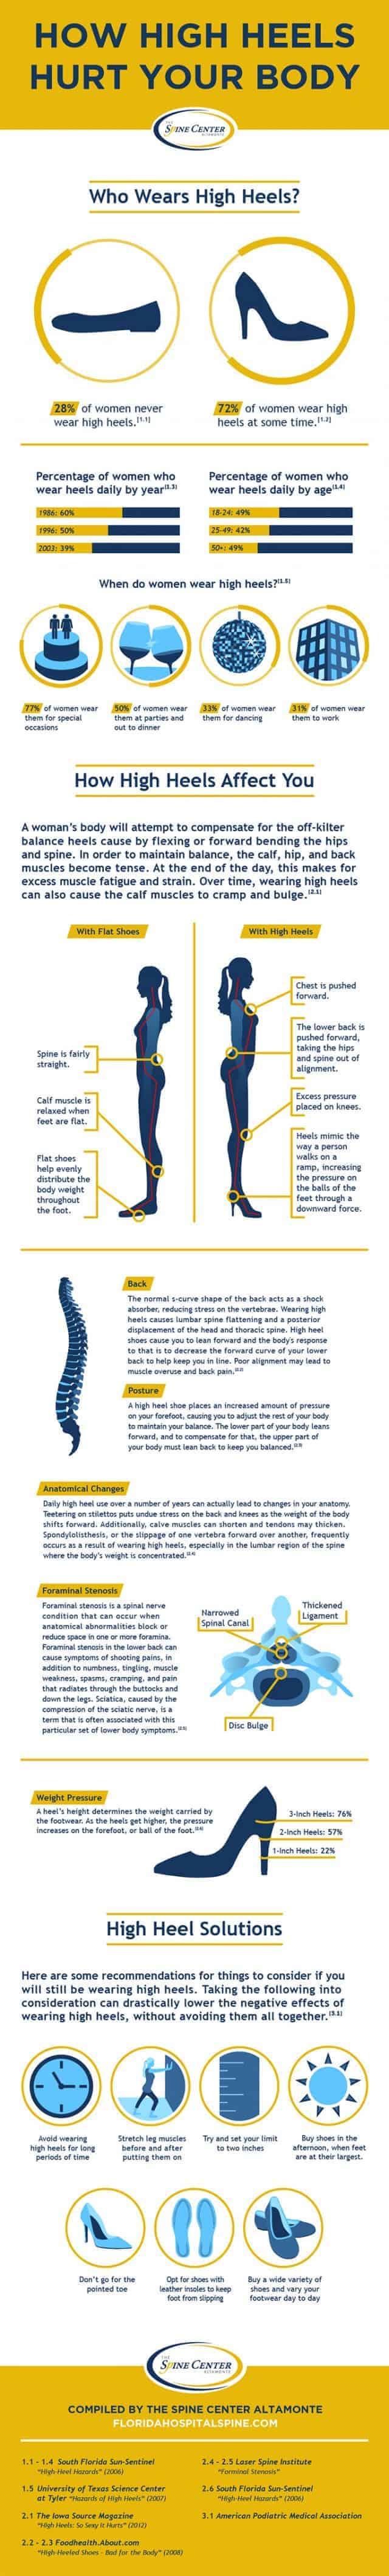 How high heels hurt your body infographic